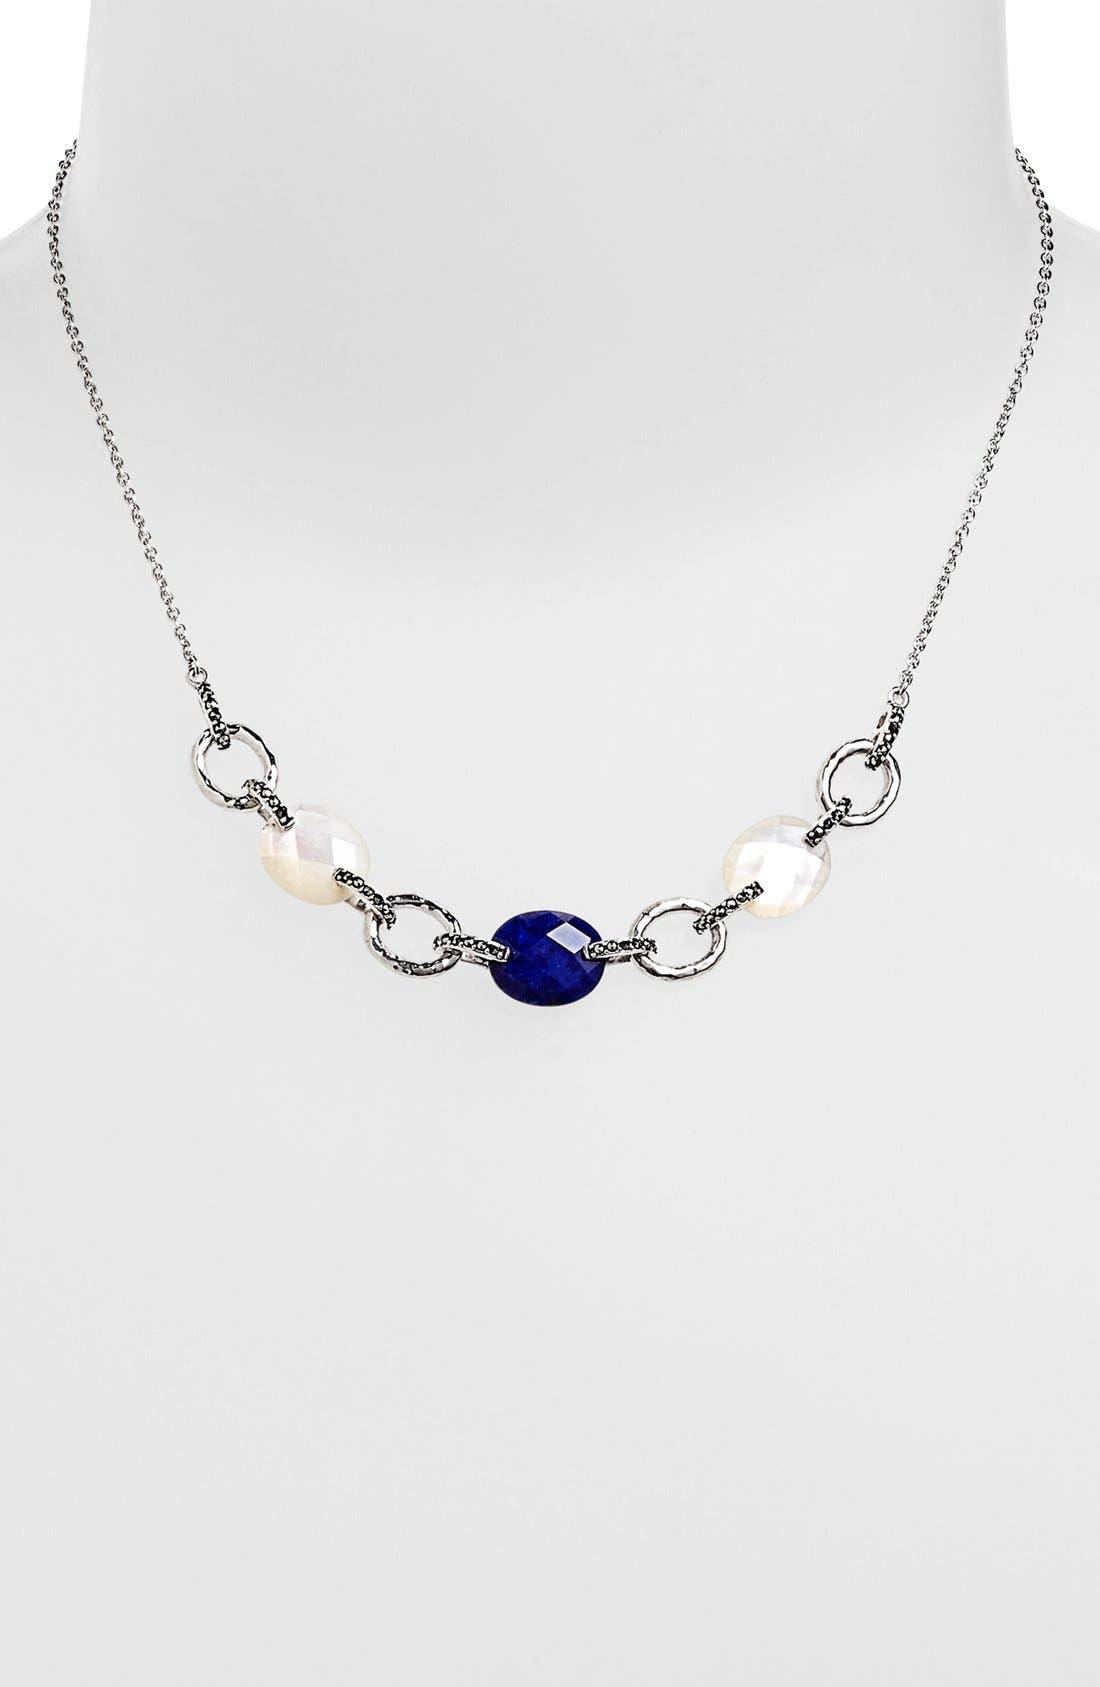 Alternate Image 1 Selected - Judith Jack 'Blue Sky' Multi Stone Frontal Necklace